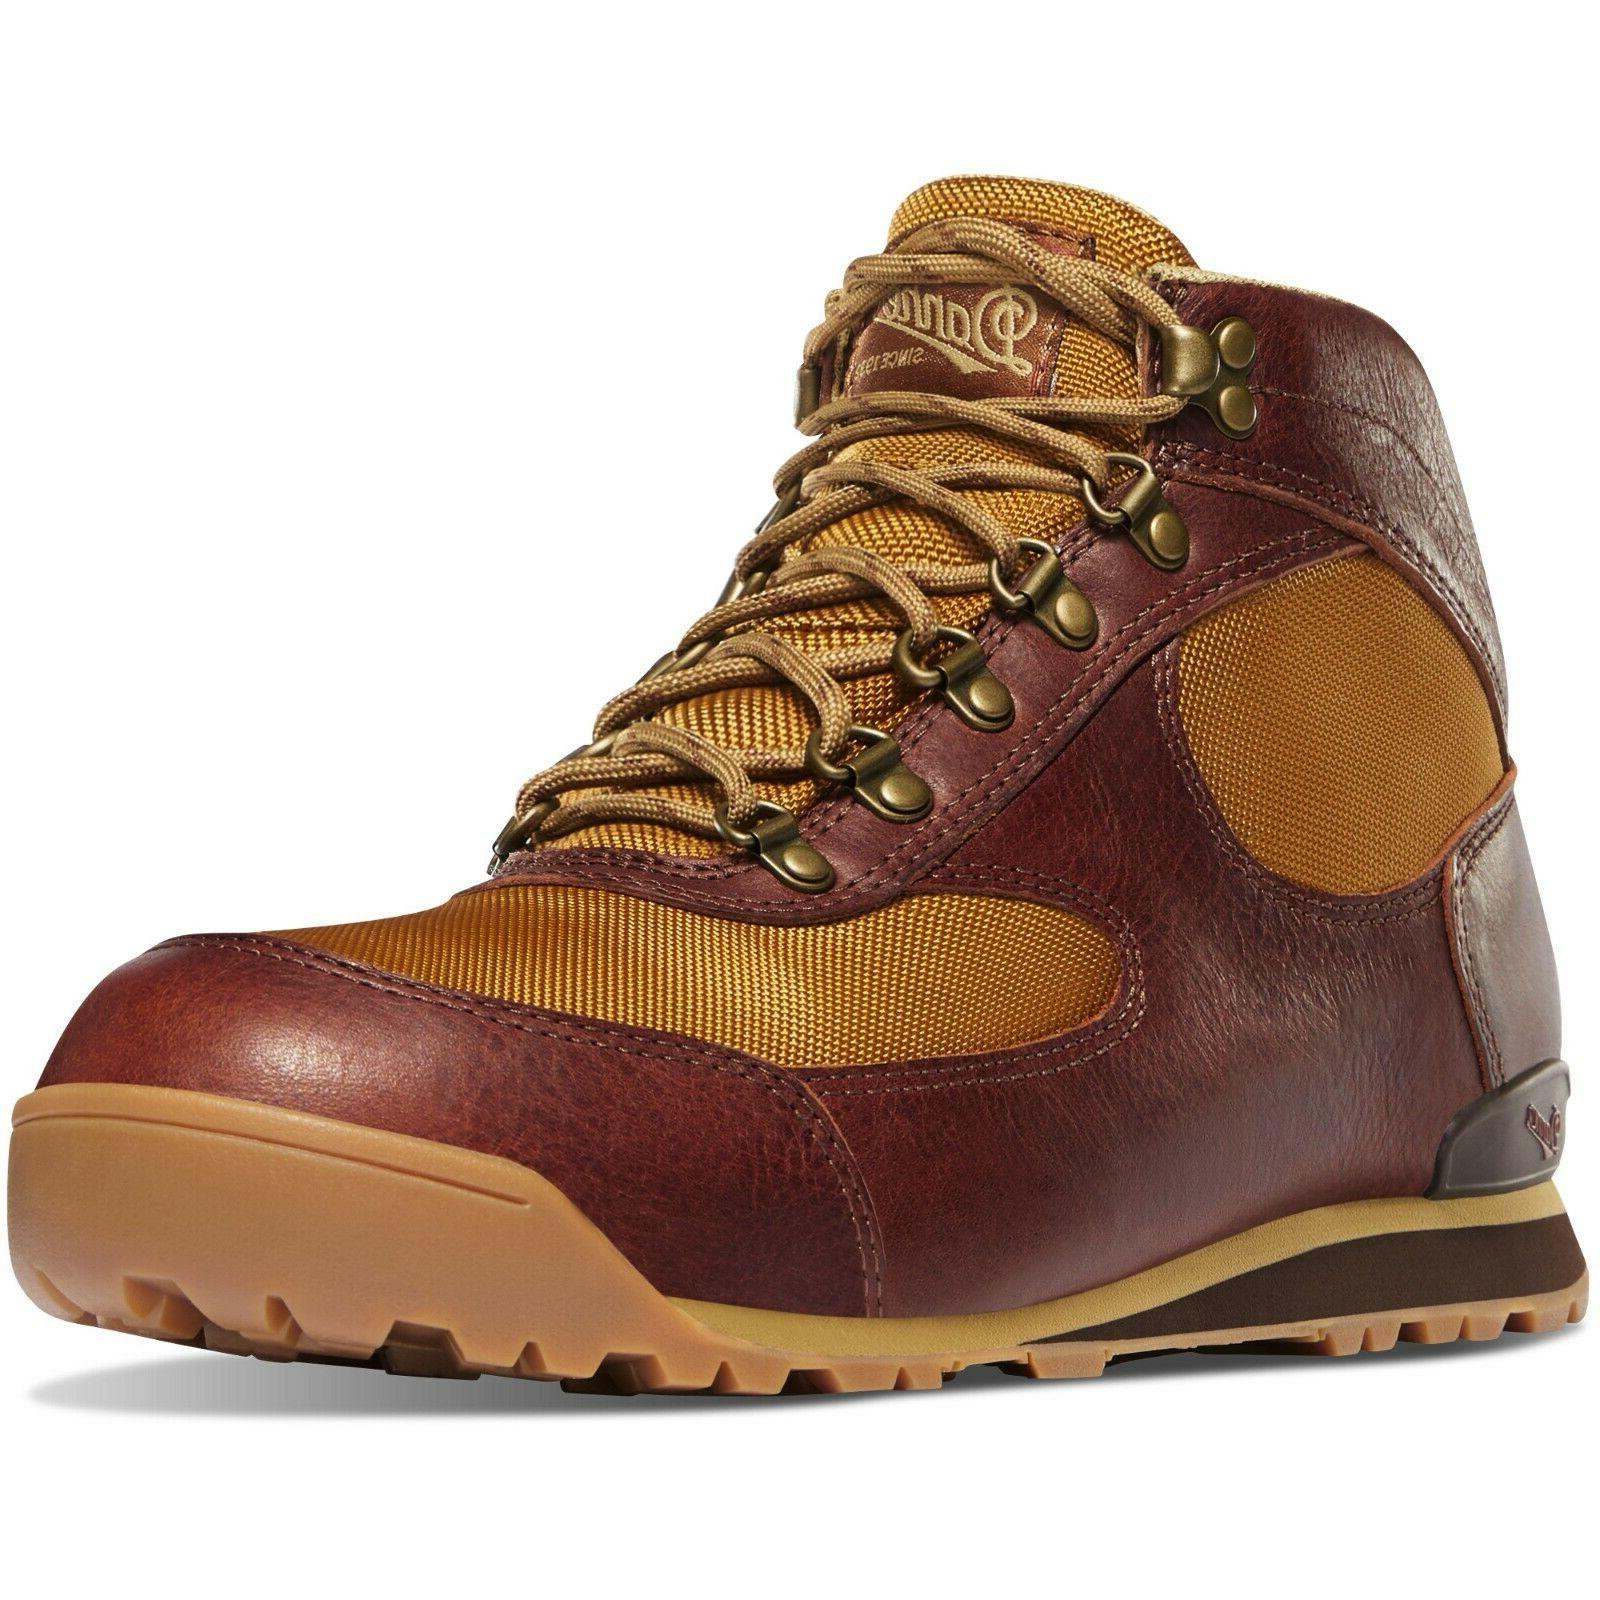 Danner Men's Jag Trail Hiking Boots 32230 Monk's Thrush